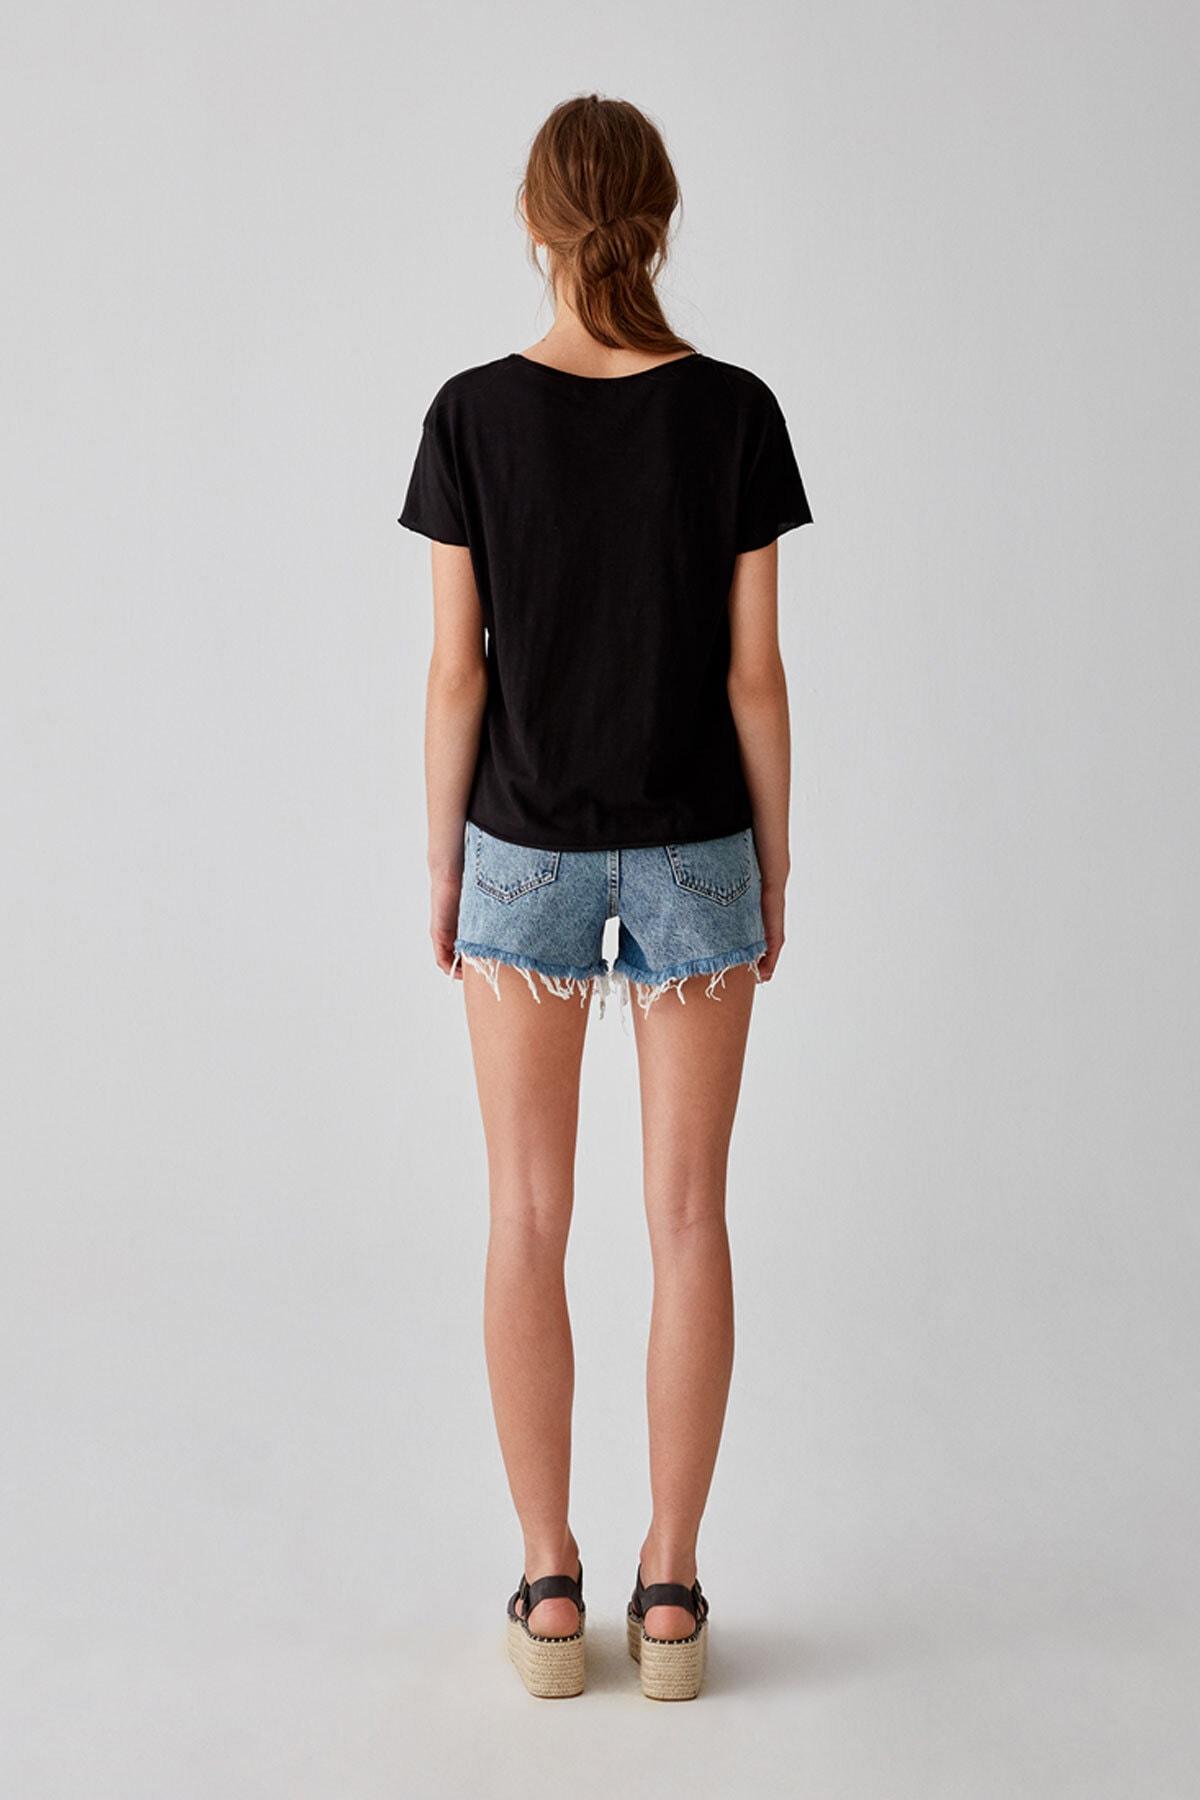 Pull & Bear Kadın Siyah Biyeli Dikişli Basic T-Shirt 05236307 2